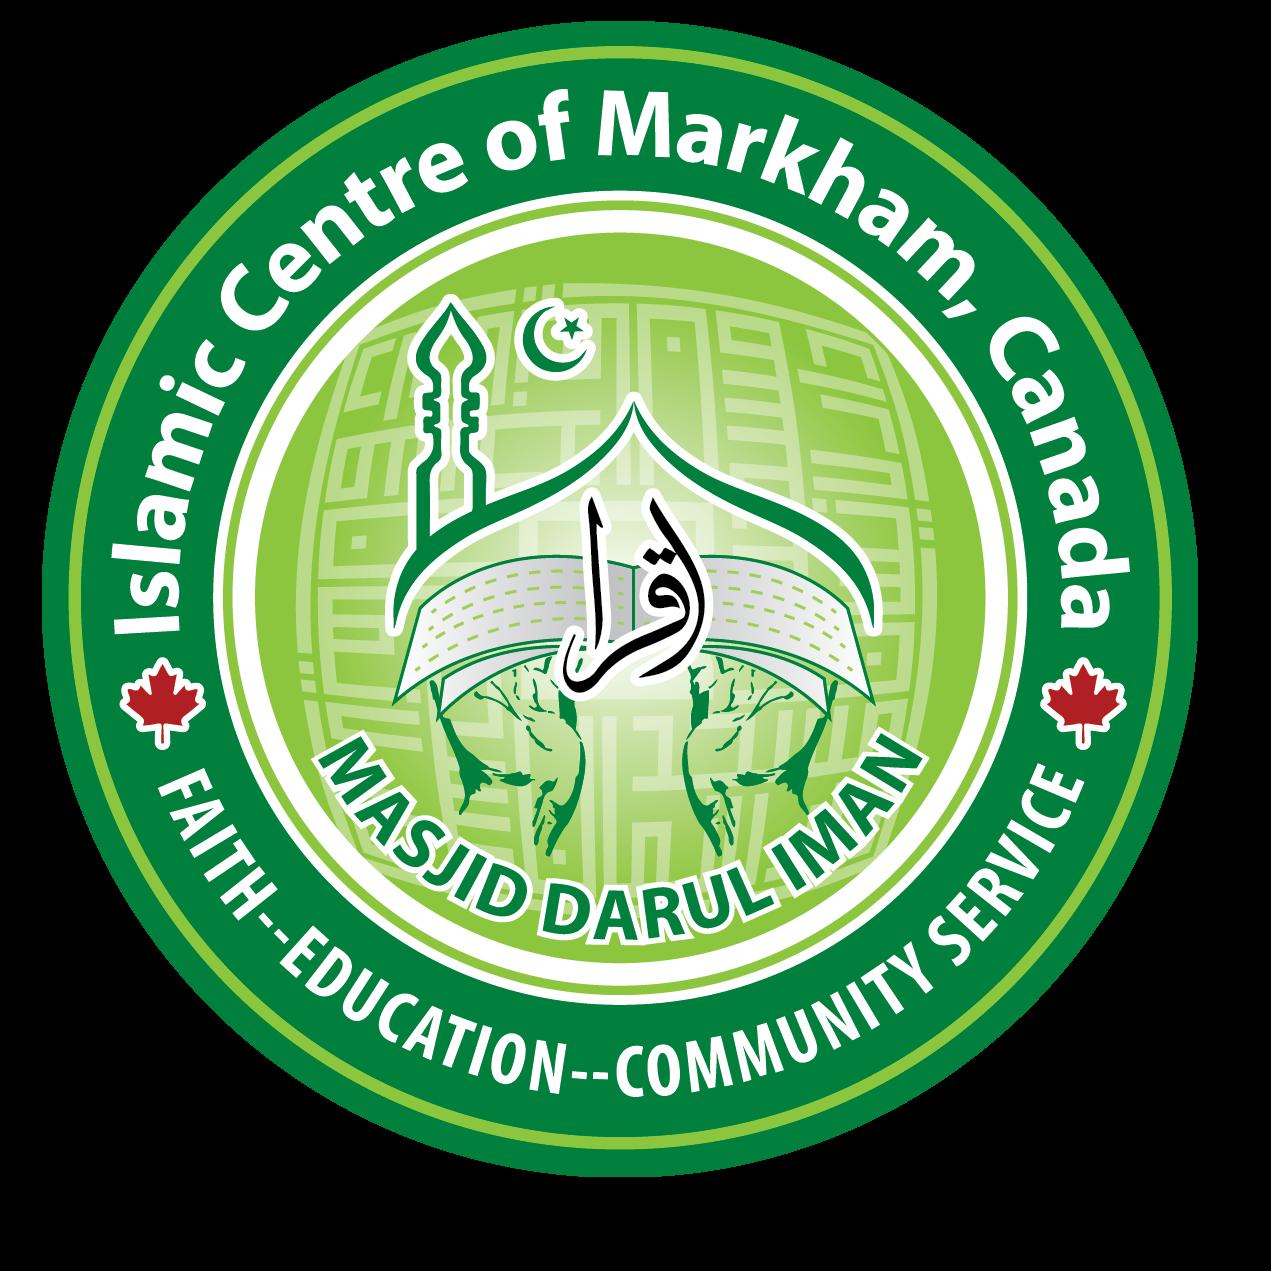 Islamic Centre of Markham / Masjid Darul Iman